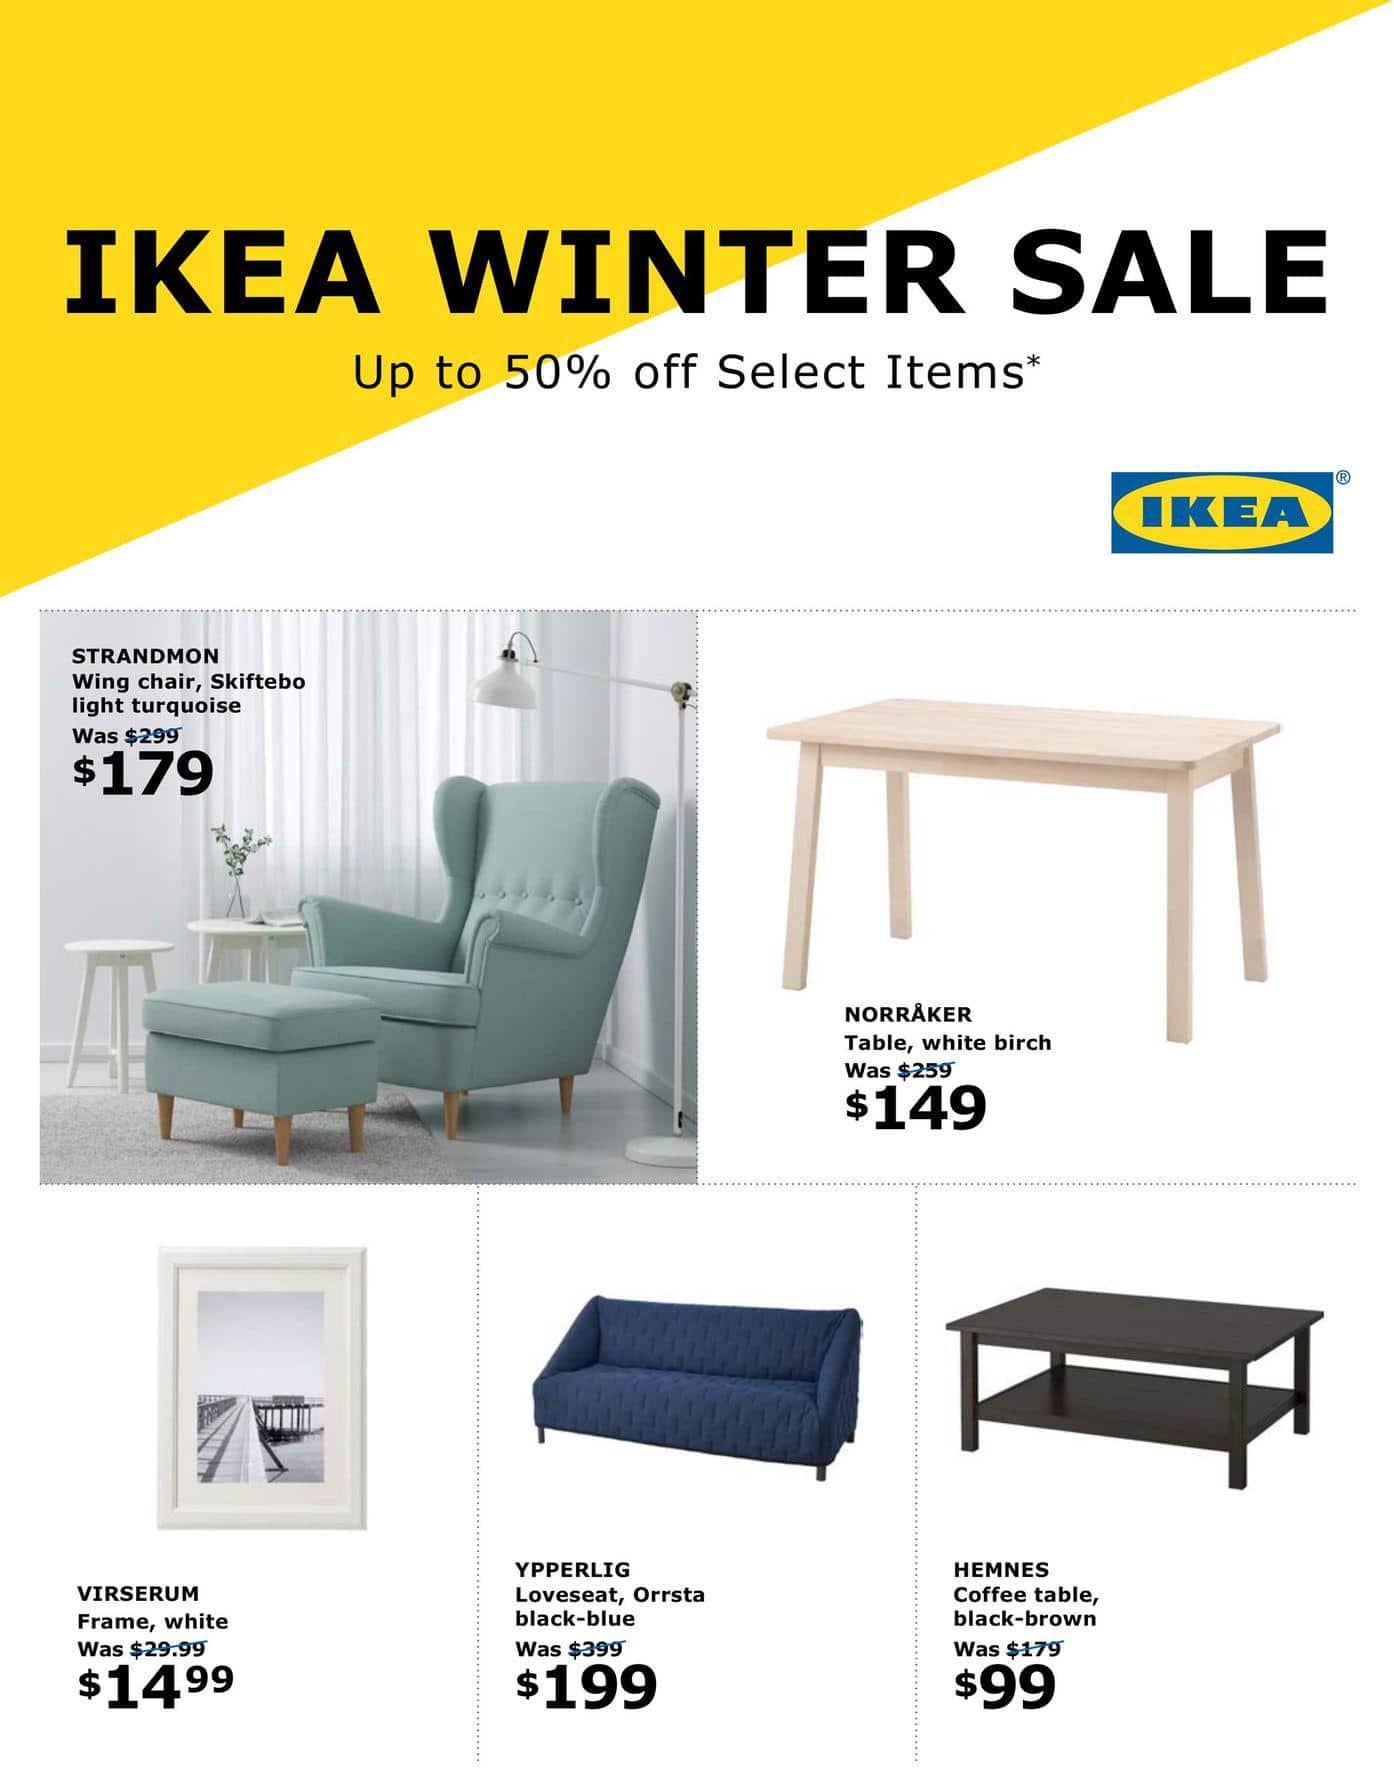 ikea boxing day sale flyer canada december 26 2018 6 january 2019. Black Bedroom Furniture Sets. Home Design Ideas